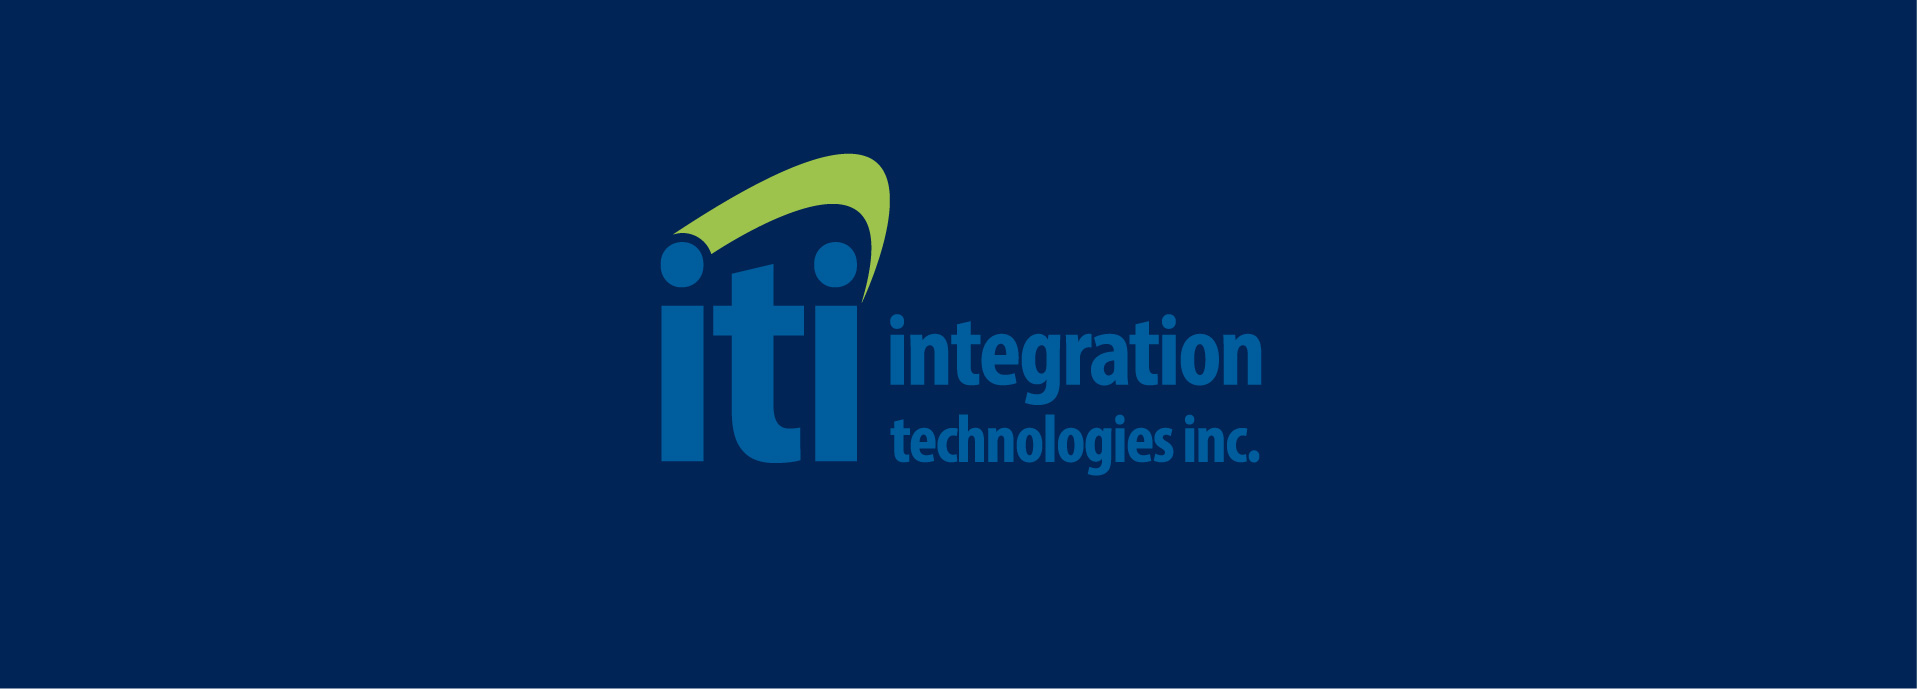 integration-technologies-inc